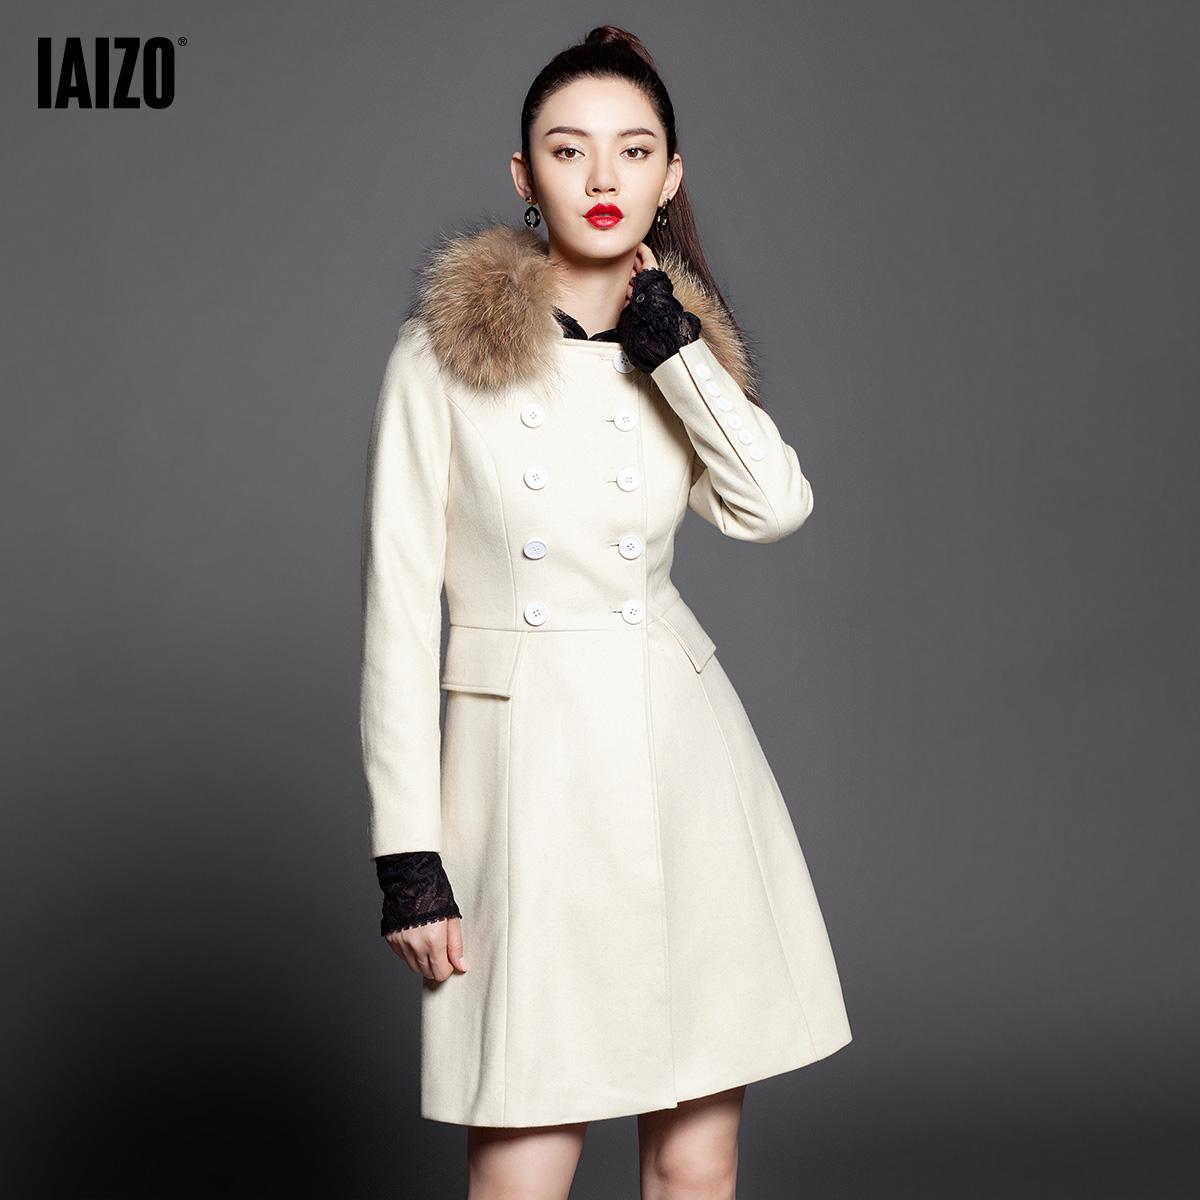 женское пальто IAIZO 12ac064009f IAIZO2013 IAIZO